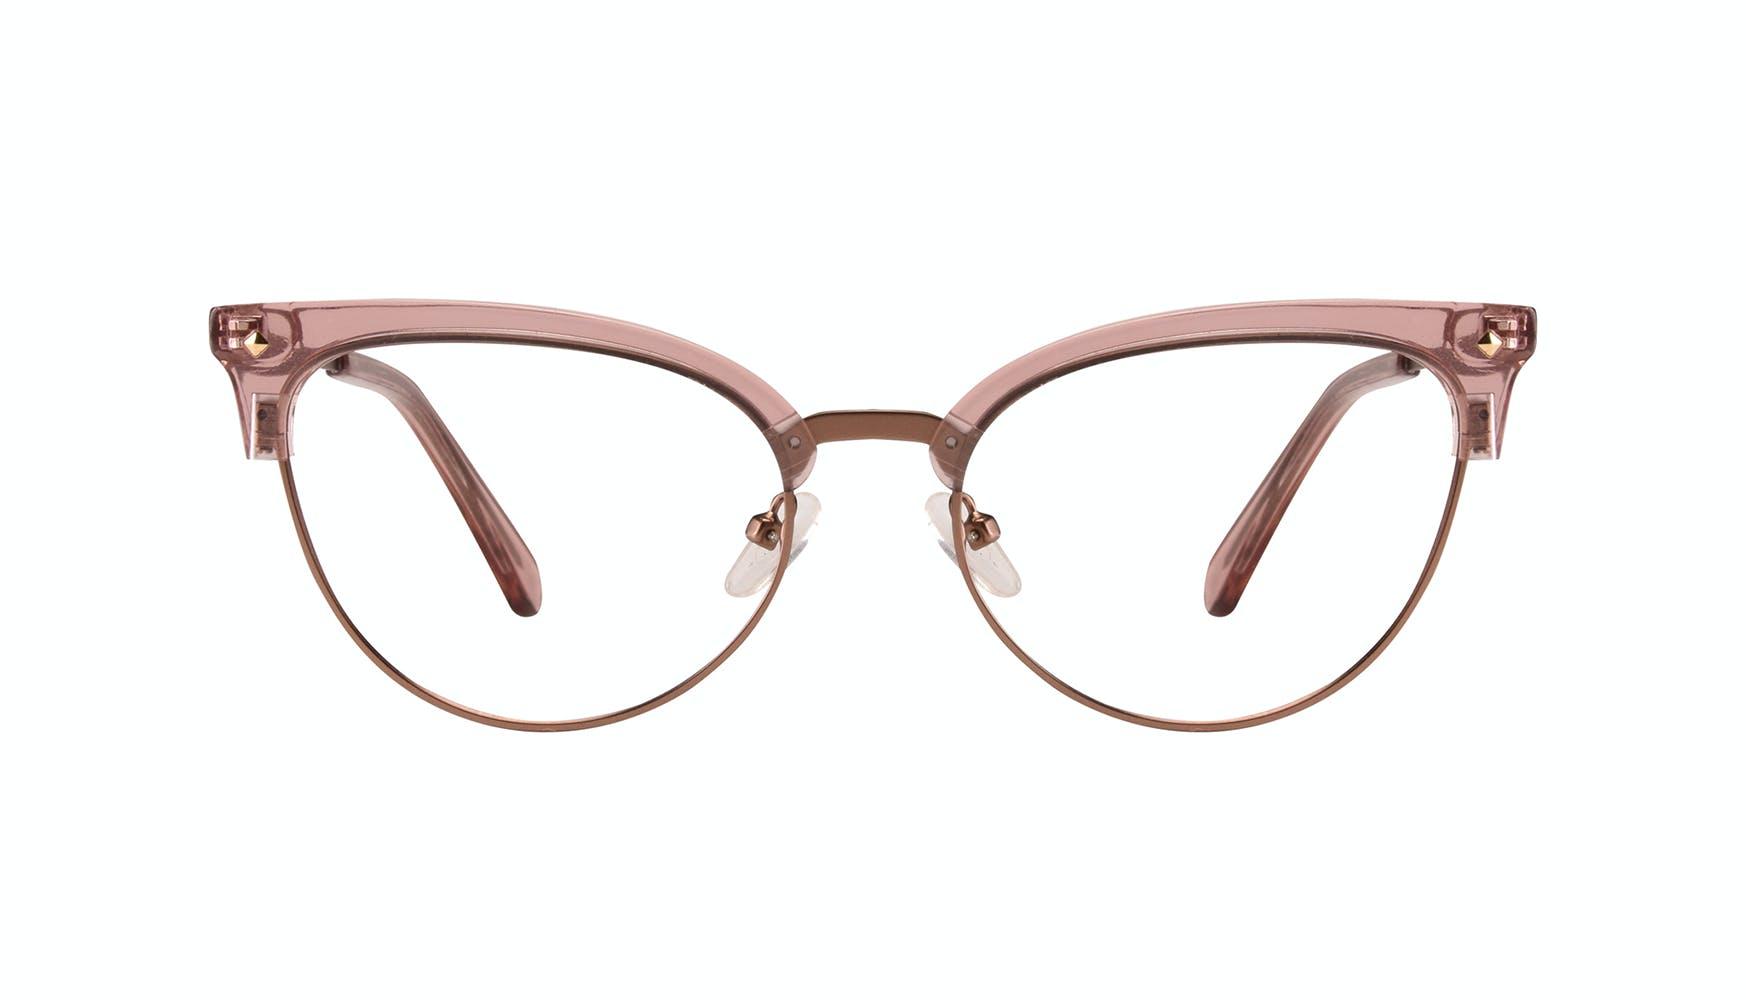 Affordable Fashion Glasses Cat Eye Daring Cateye Eyeglasses Women Moon Rose